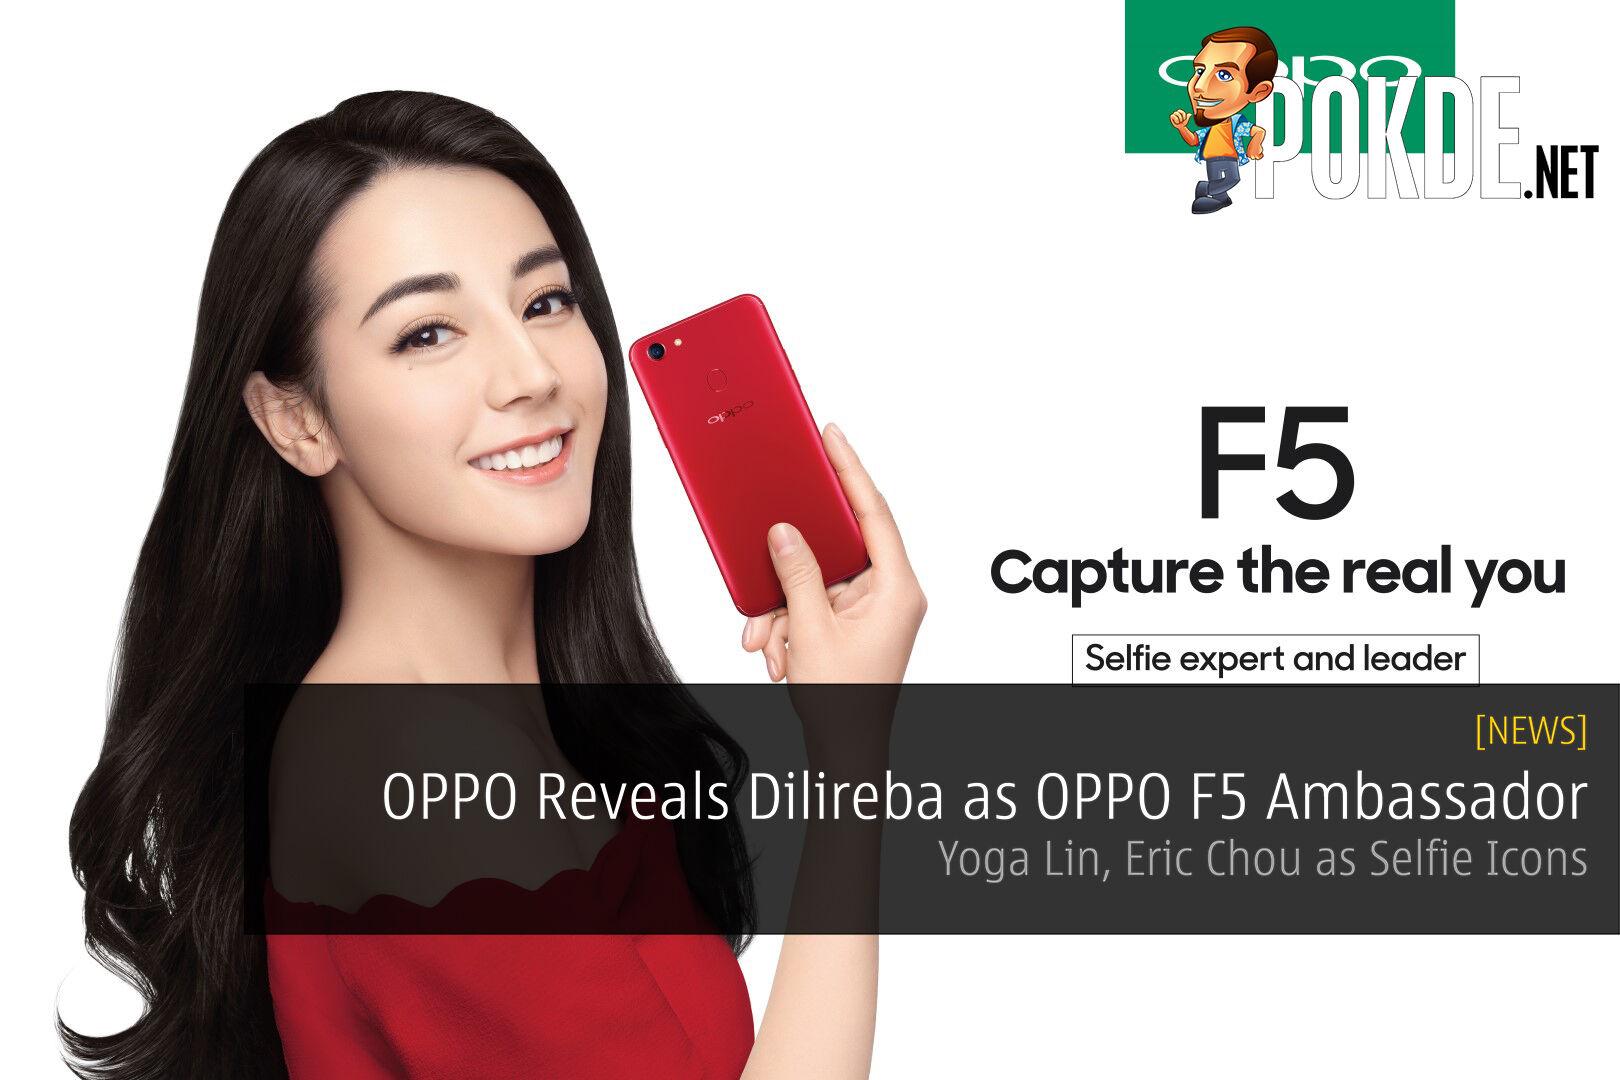 OPPO Reveals Dilireba as OPPO F5 Ambassador - Yoga Lin, Eric Chou as Selfie Icons 28